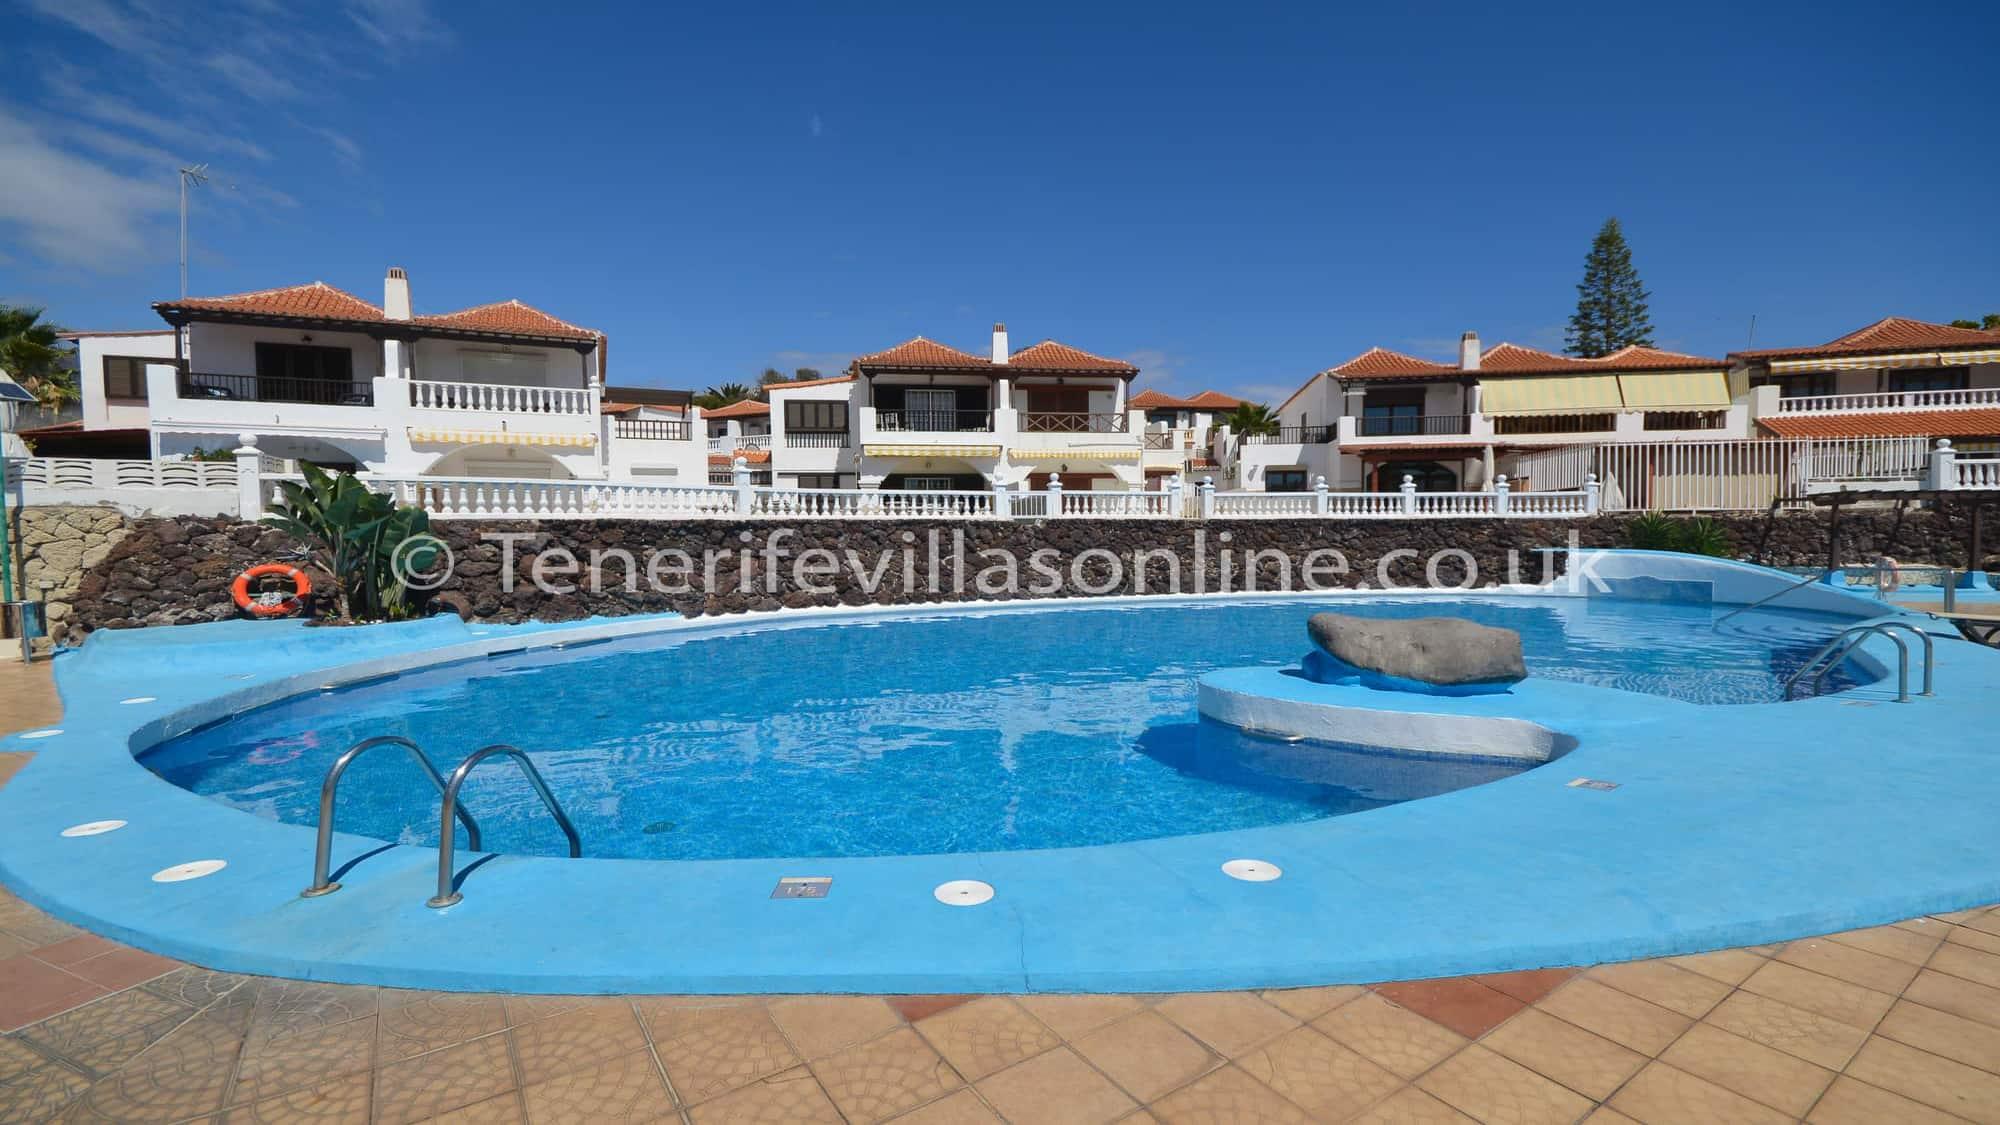 6 bedroom villa for rent in Tenerife Las Americas Sleeps 15